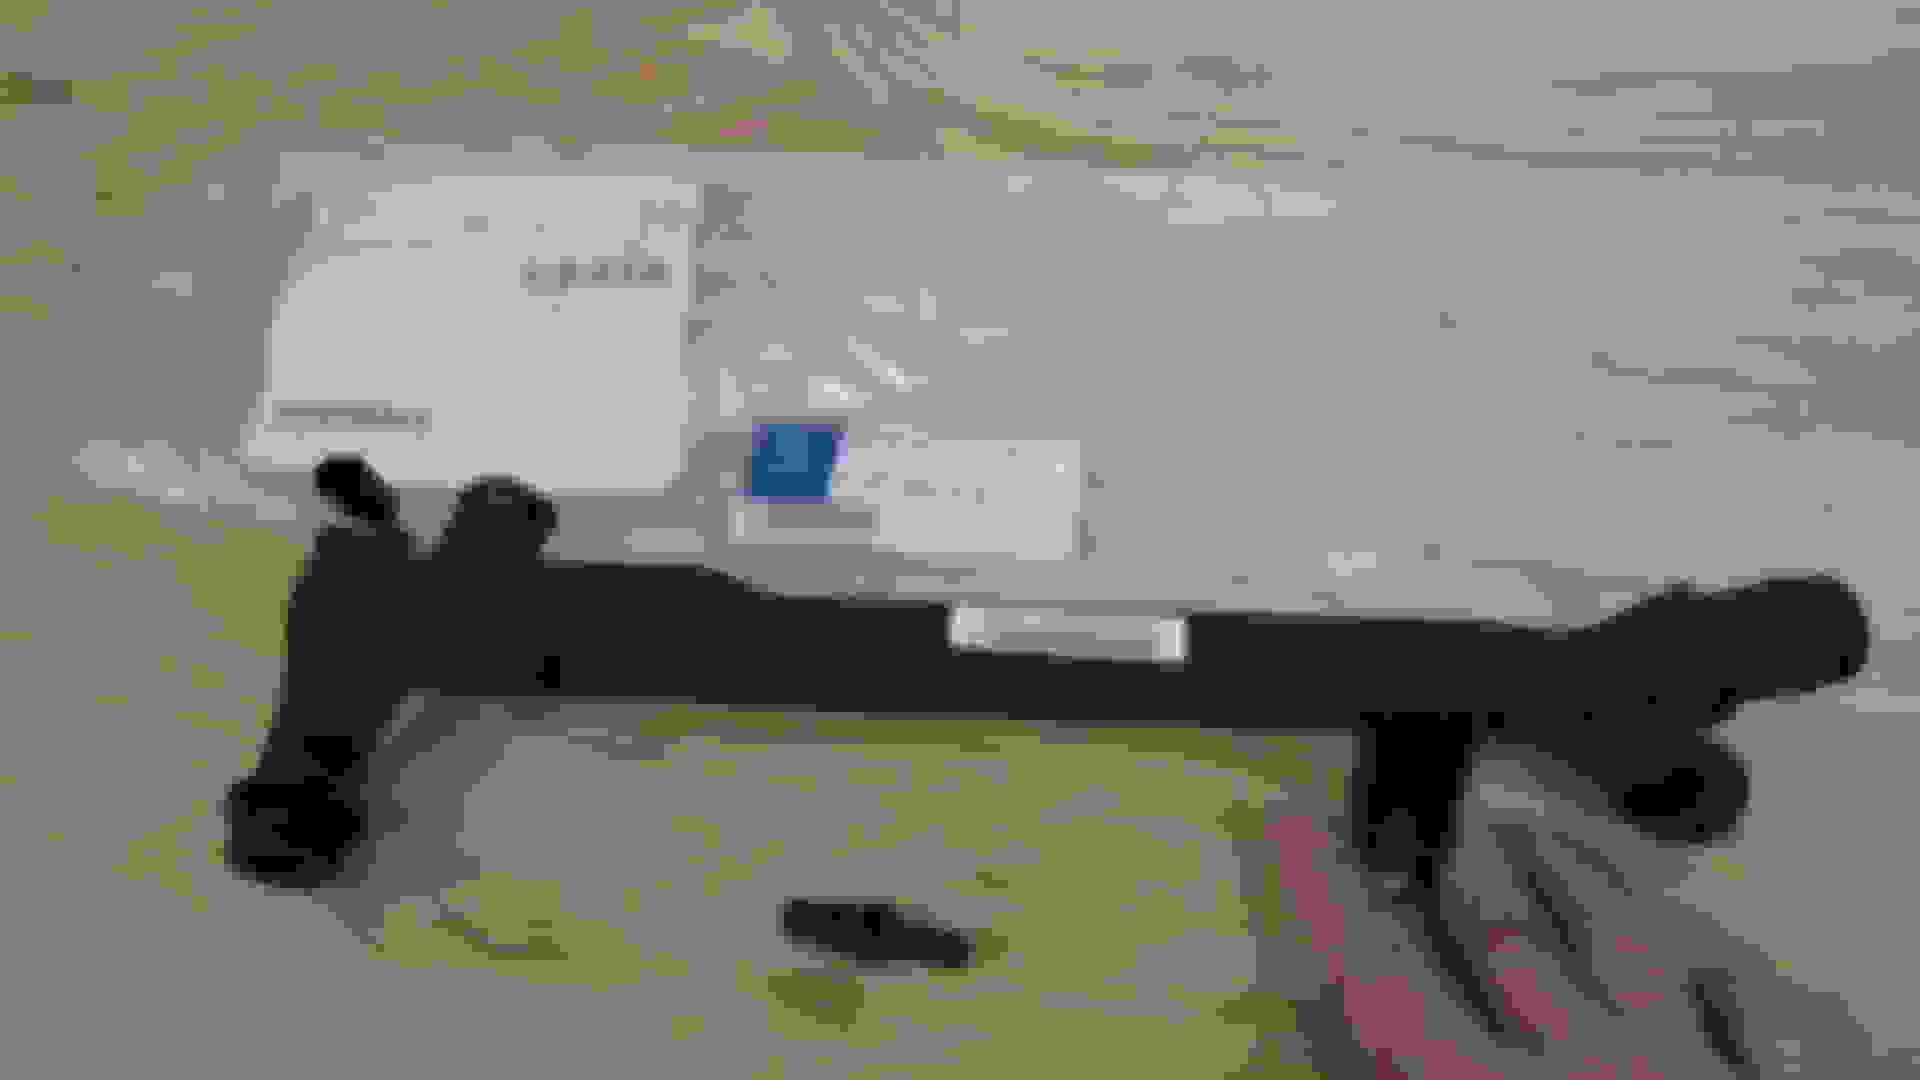 Coolant leak   I Think I found the source - Page 2 - MBWorld